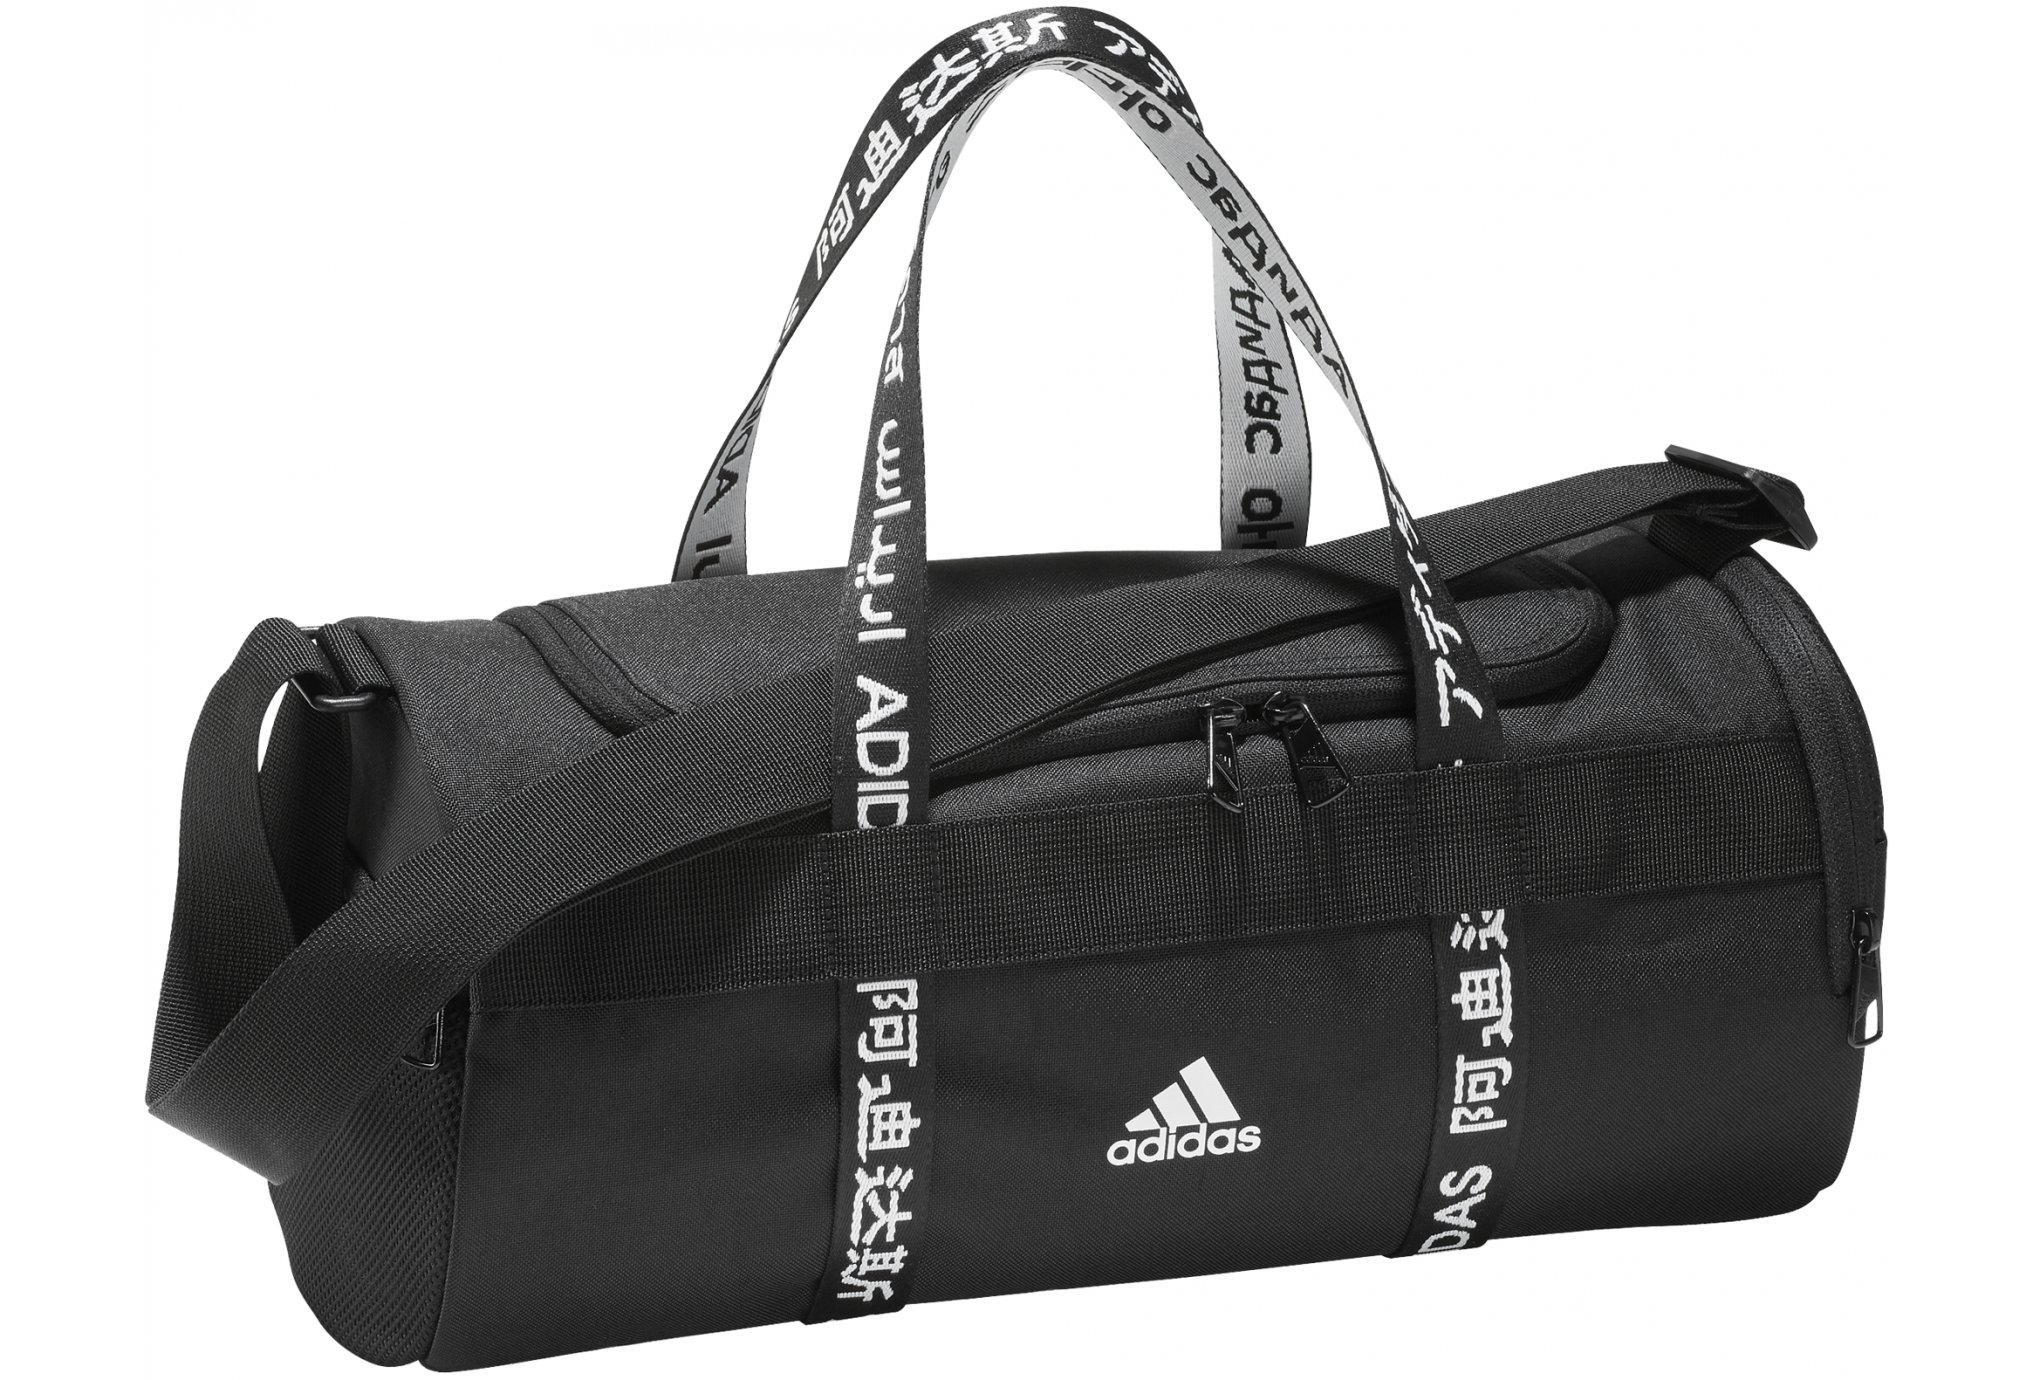 Adidas 4 athletes- xs sac de sport